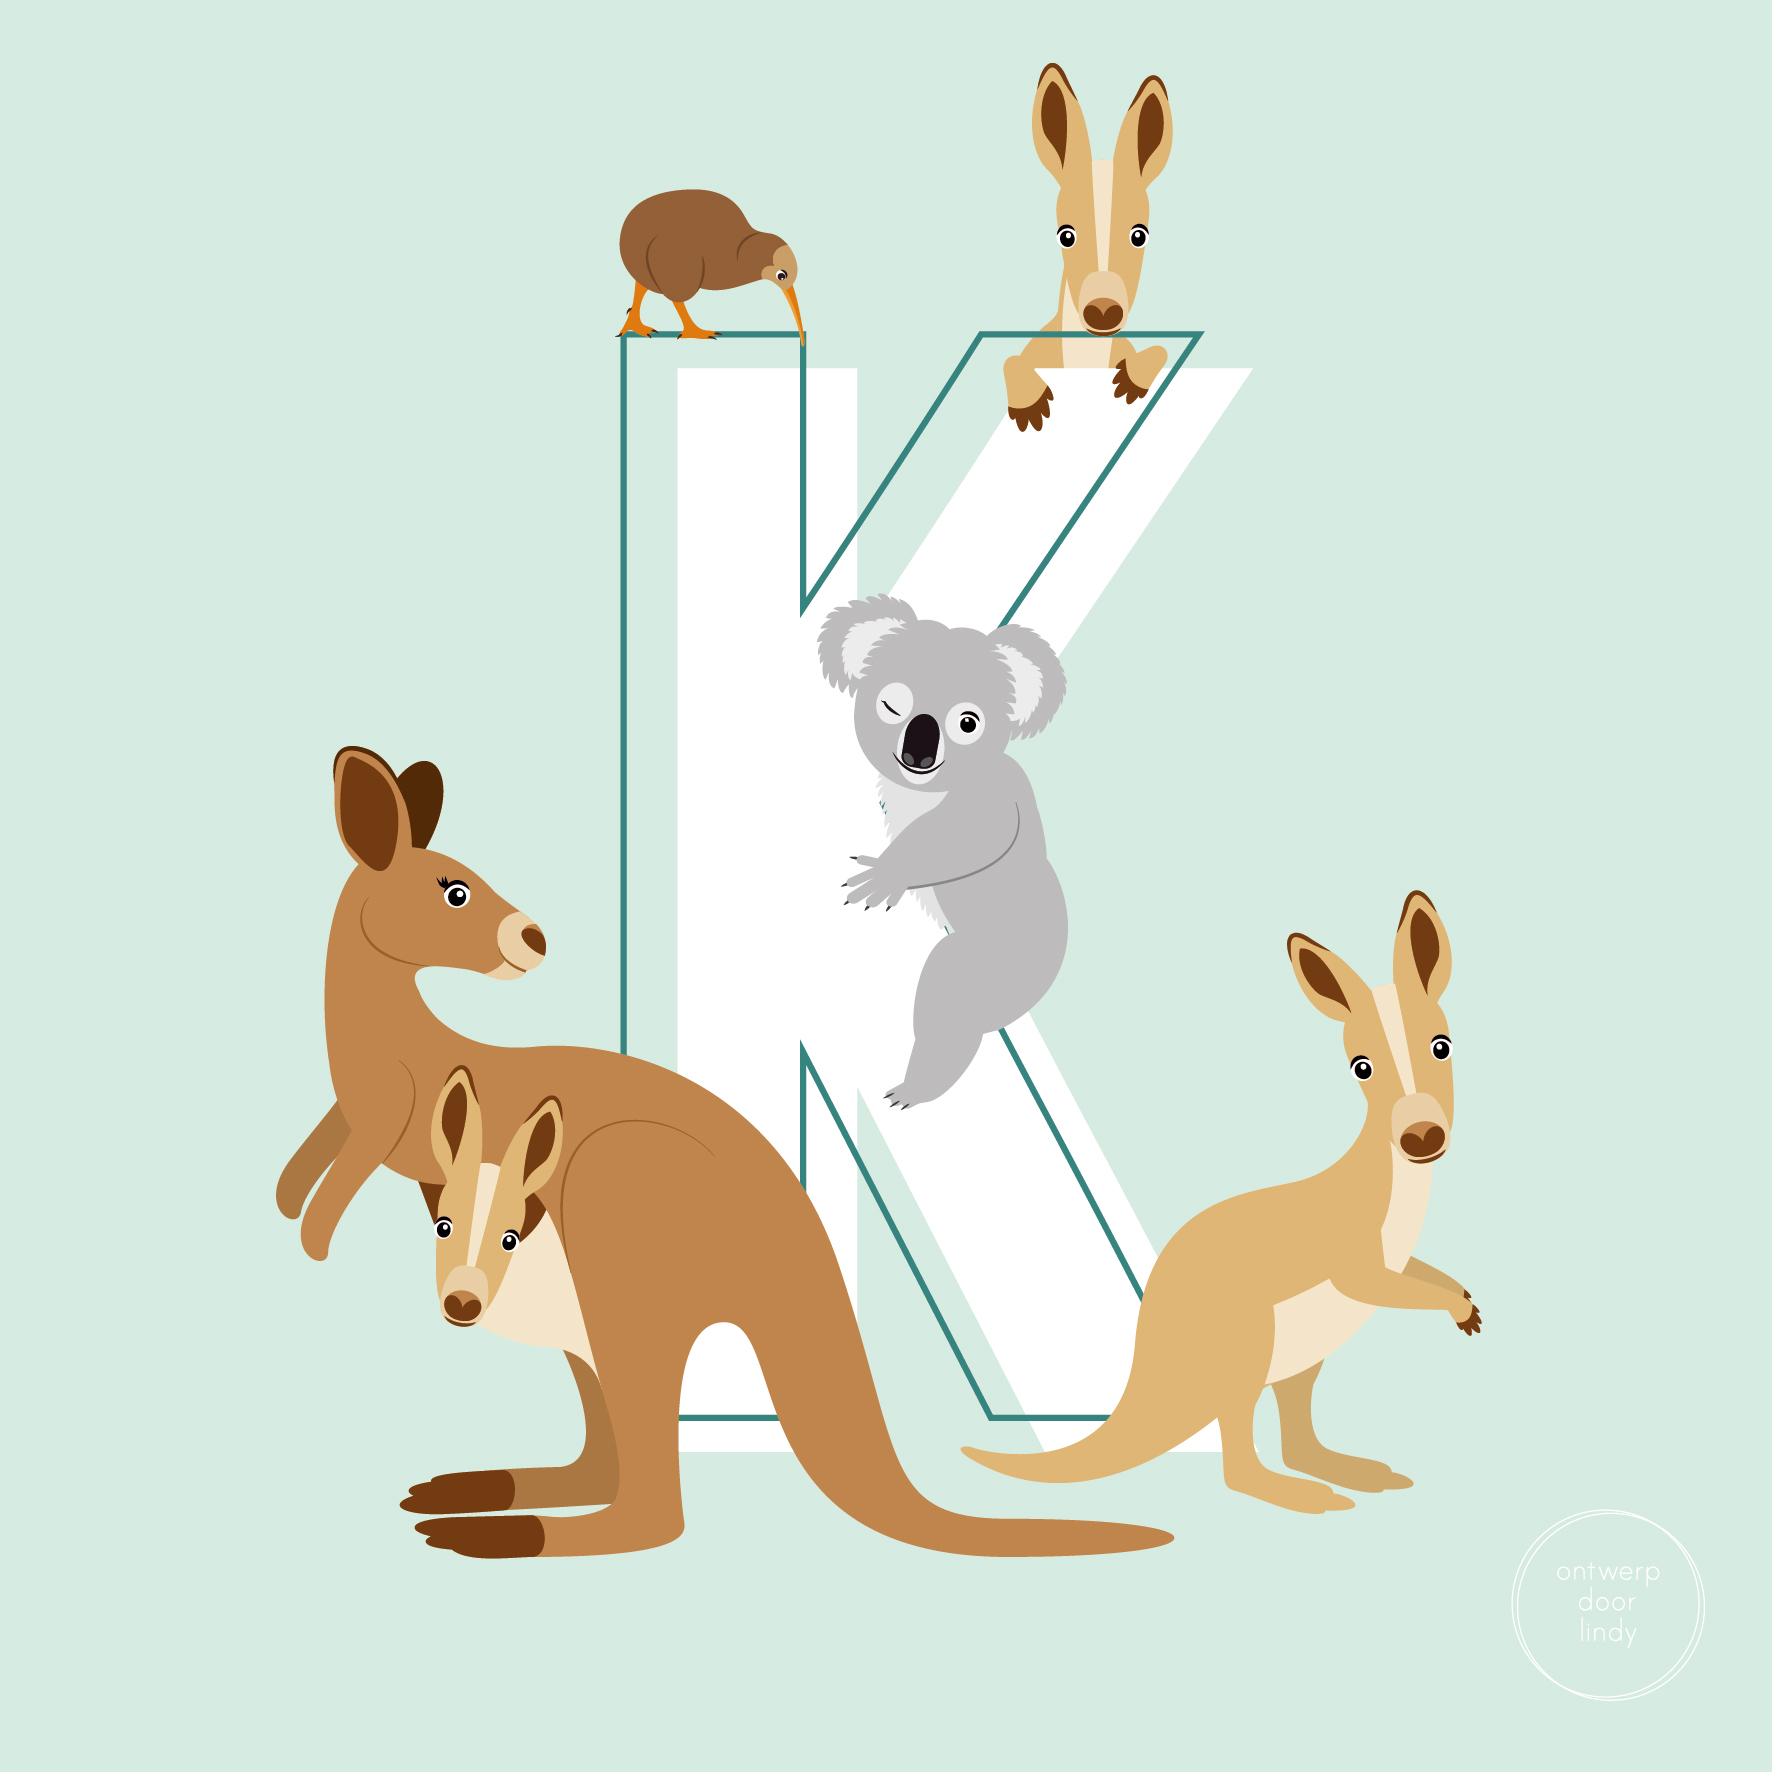 kangoeroes koala kiwi australie ontwerp door lindy